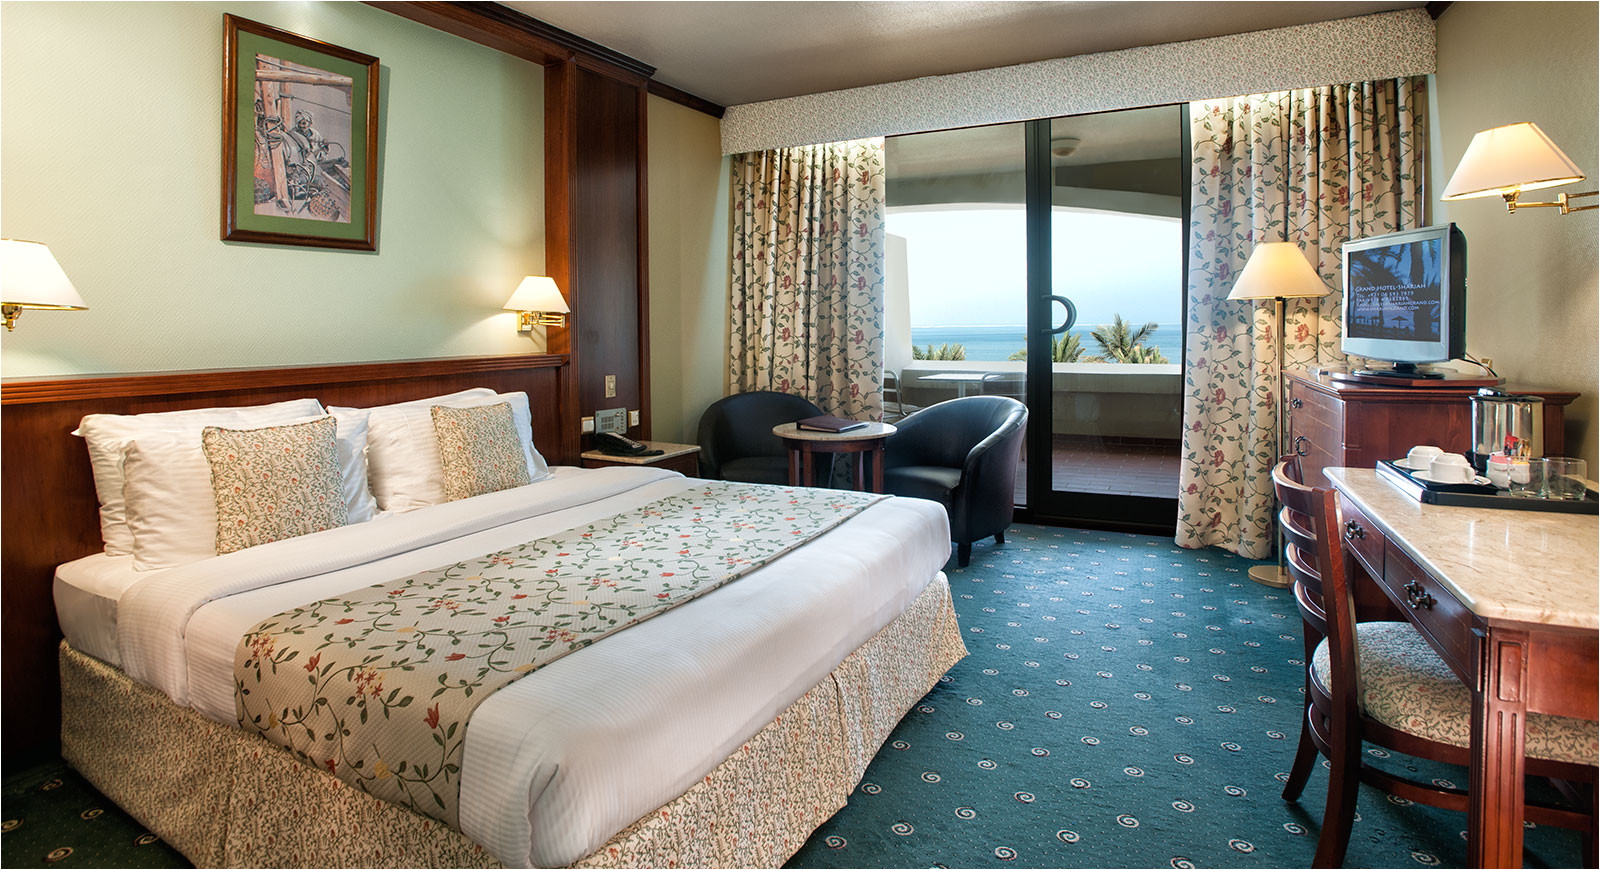 000 room sea view 1 sharjah grand hotel tcm21 116482 jpg